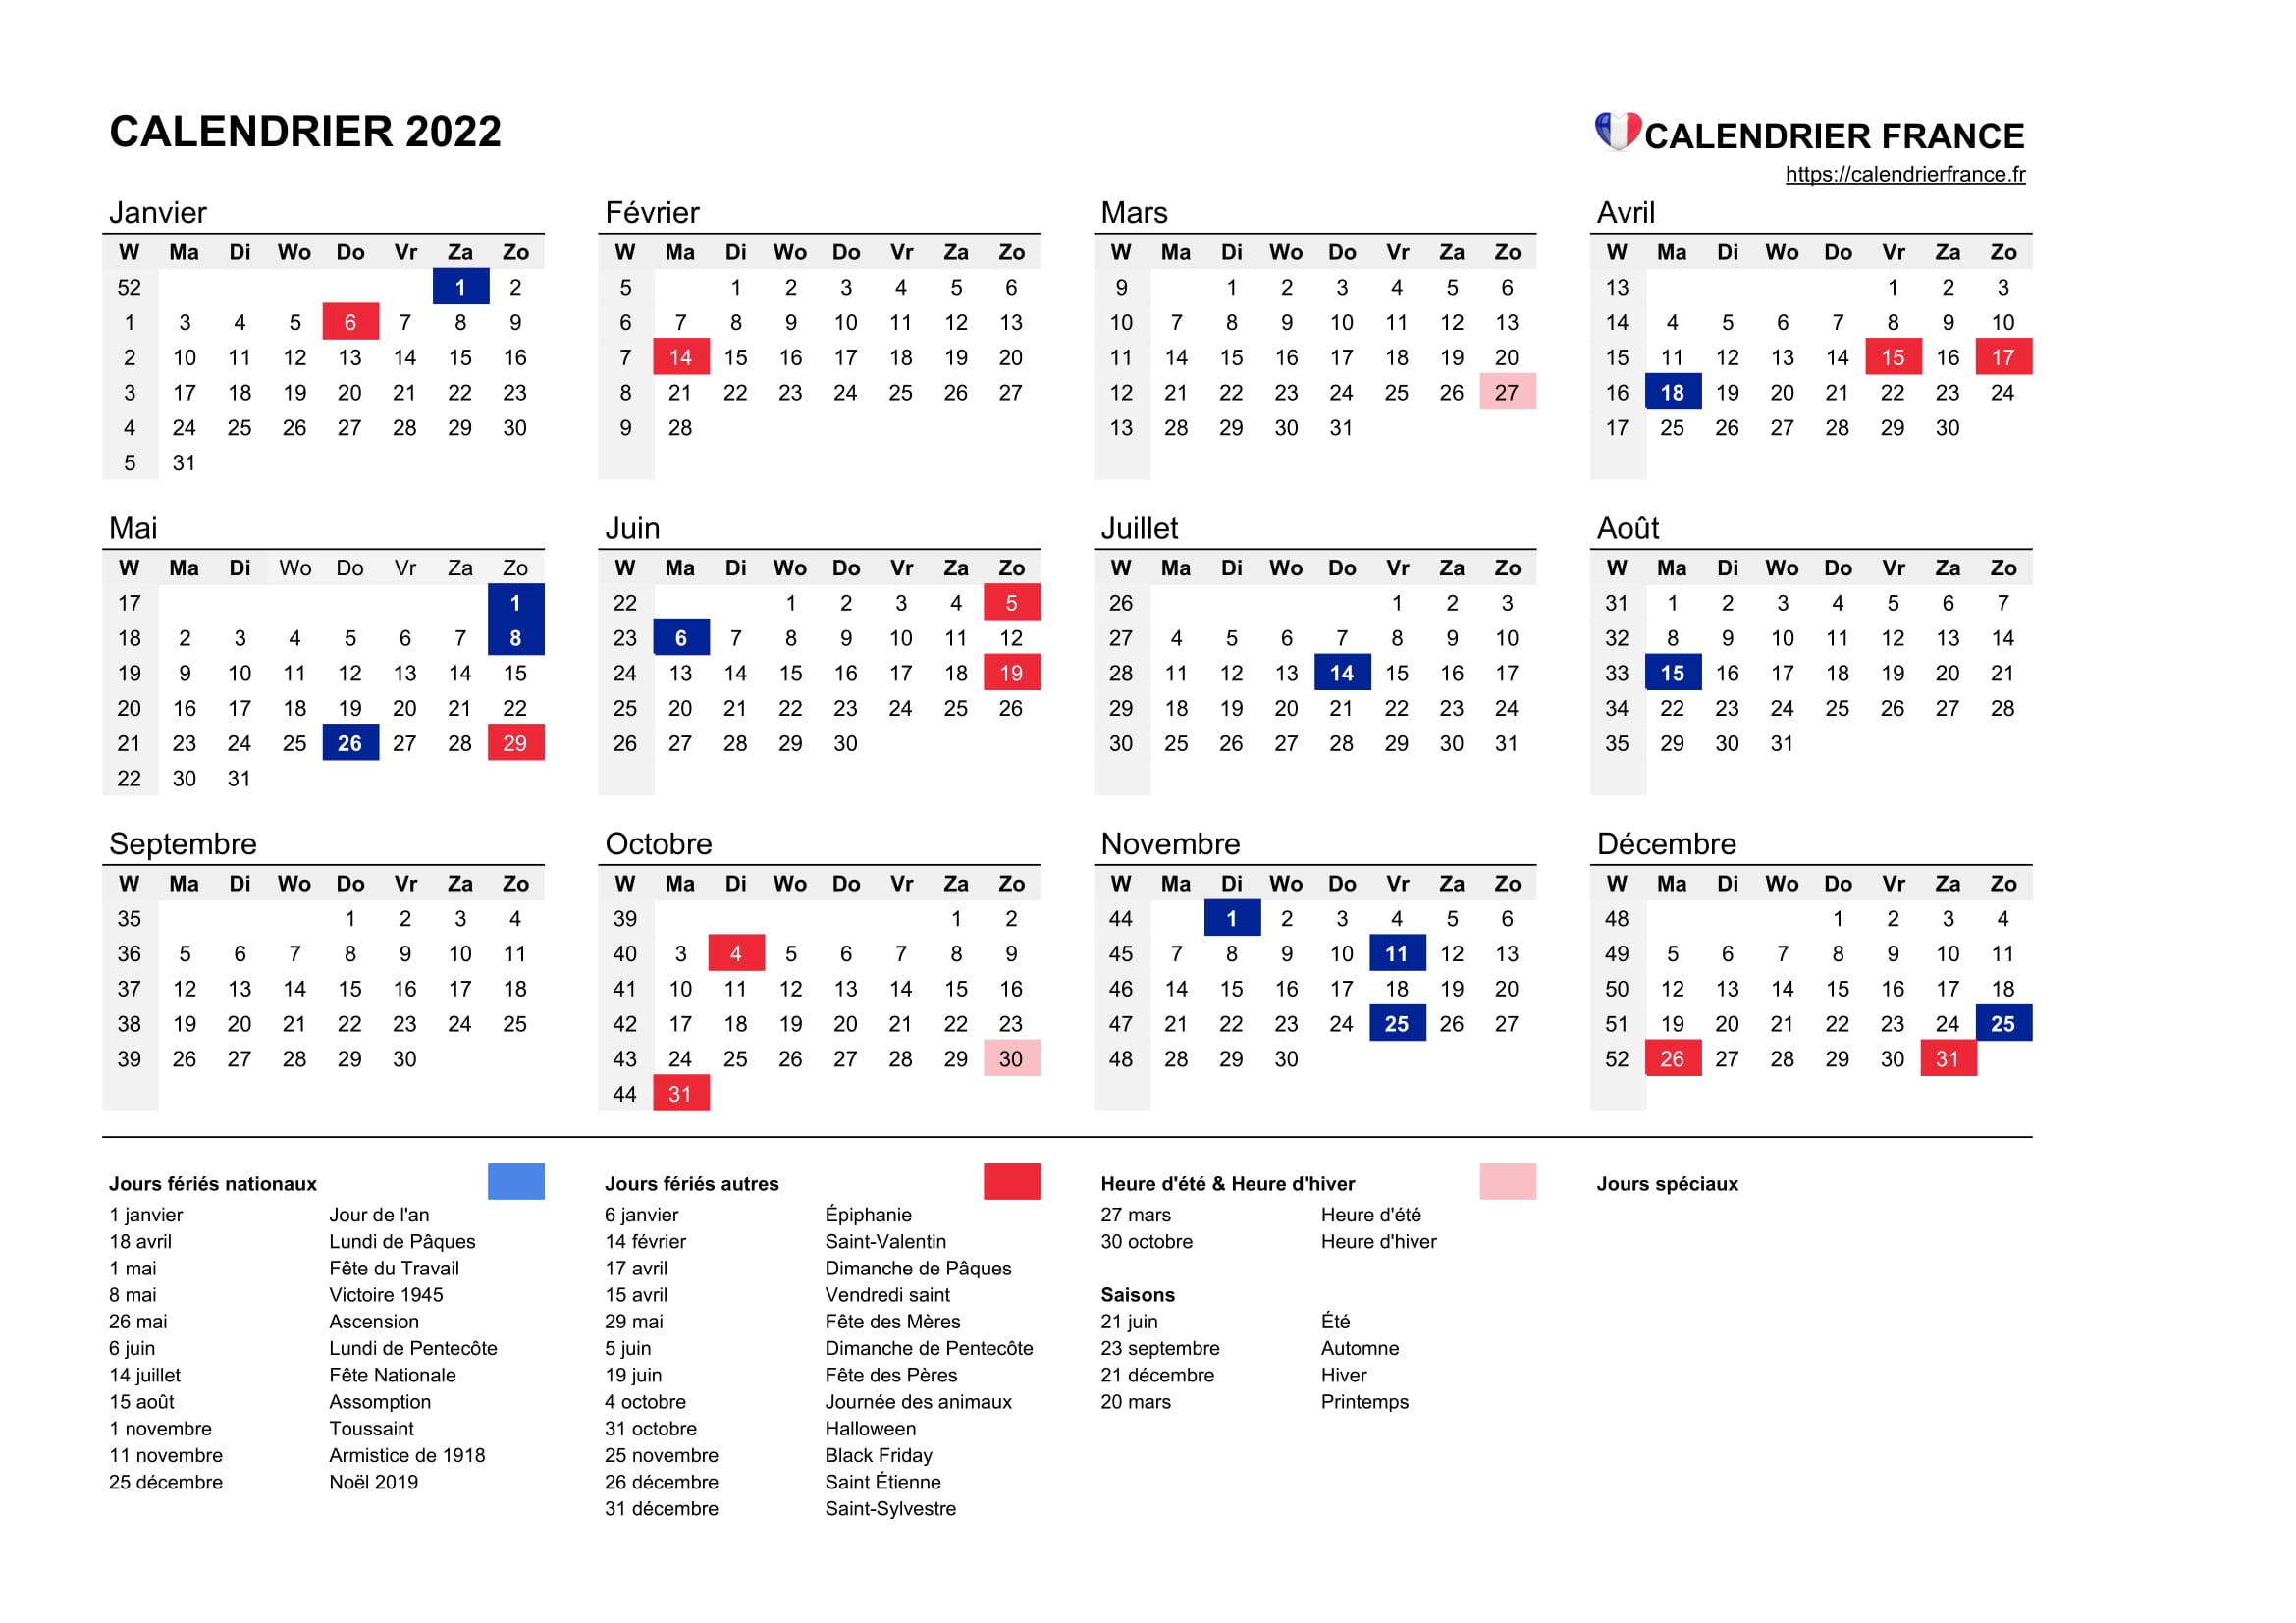 Calendrier 2022 Fete Des Meres Calendrier 2022 • Calendrier France